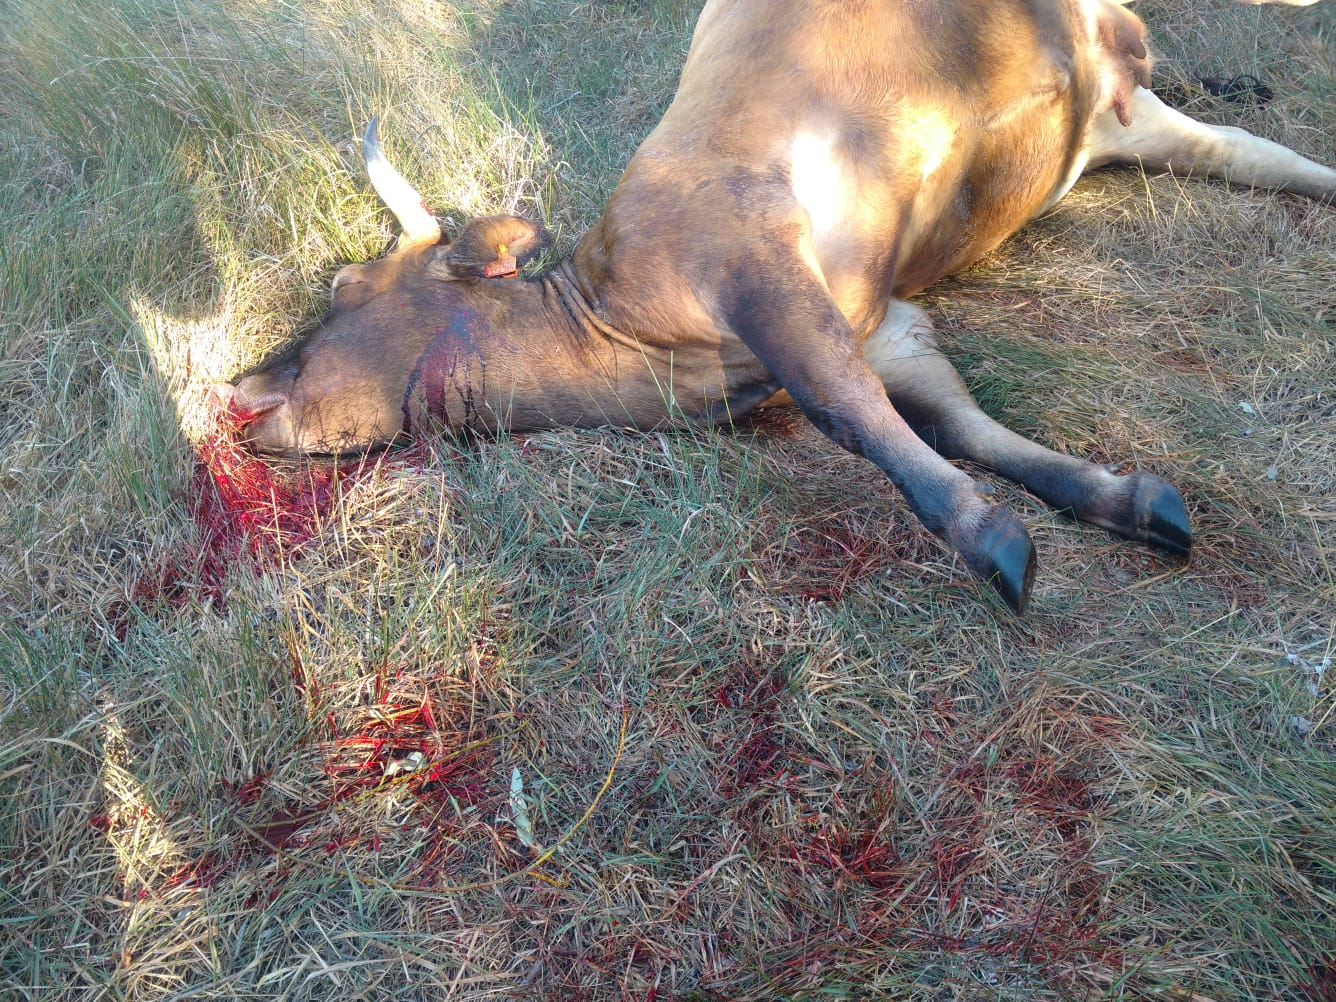 Brutal muerte de cuatro vacas